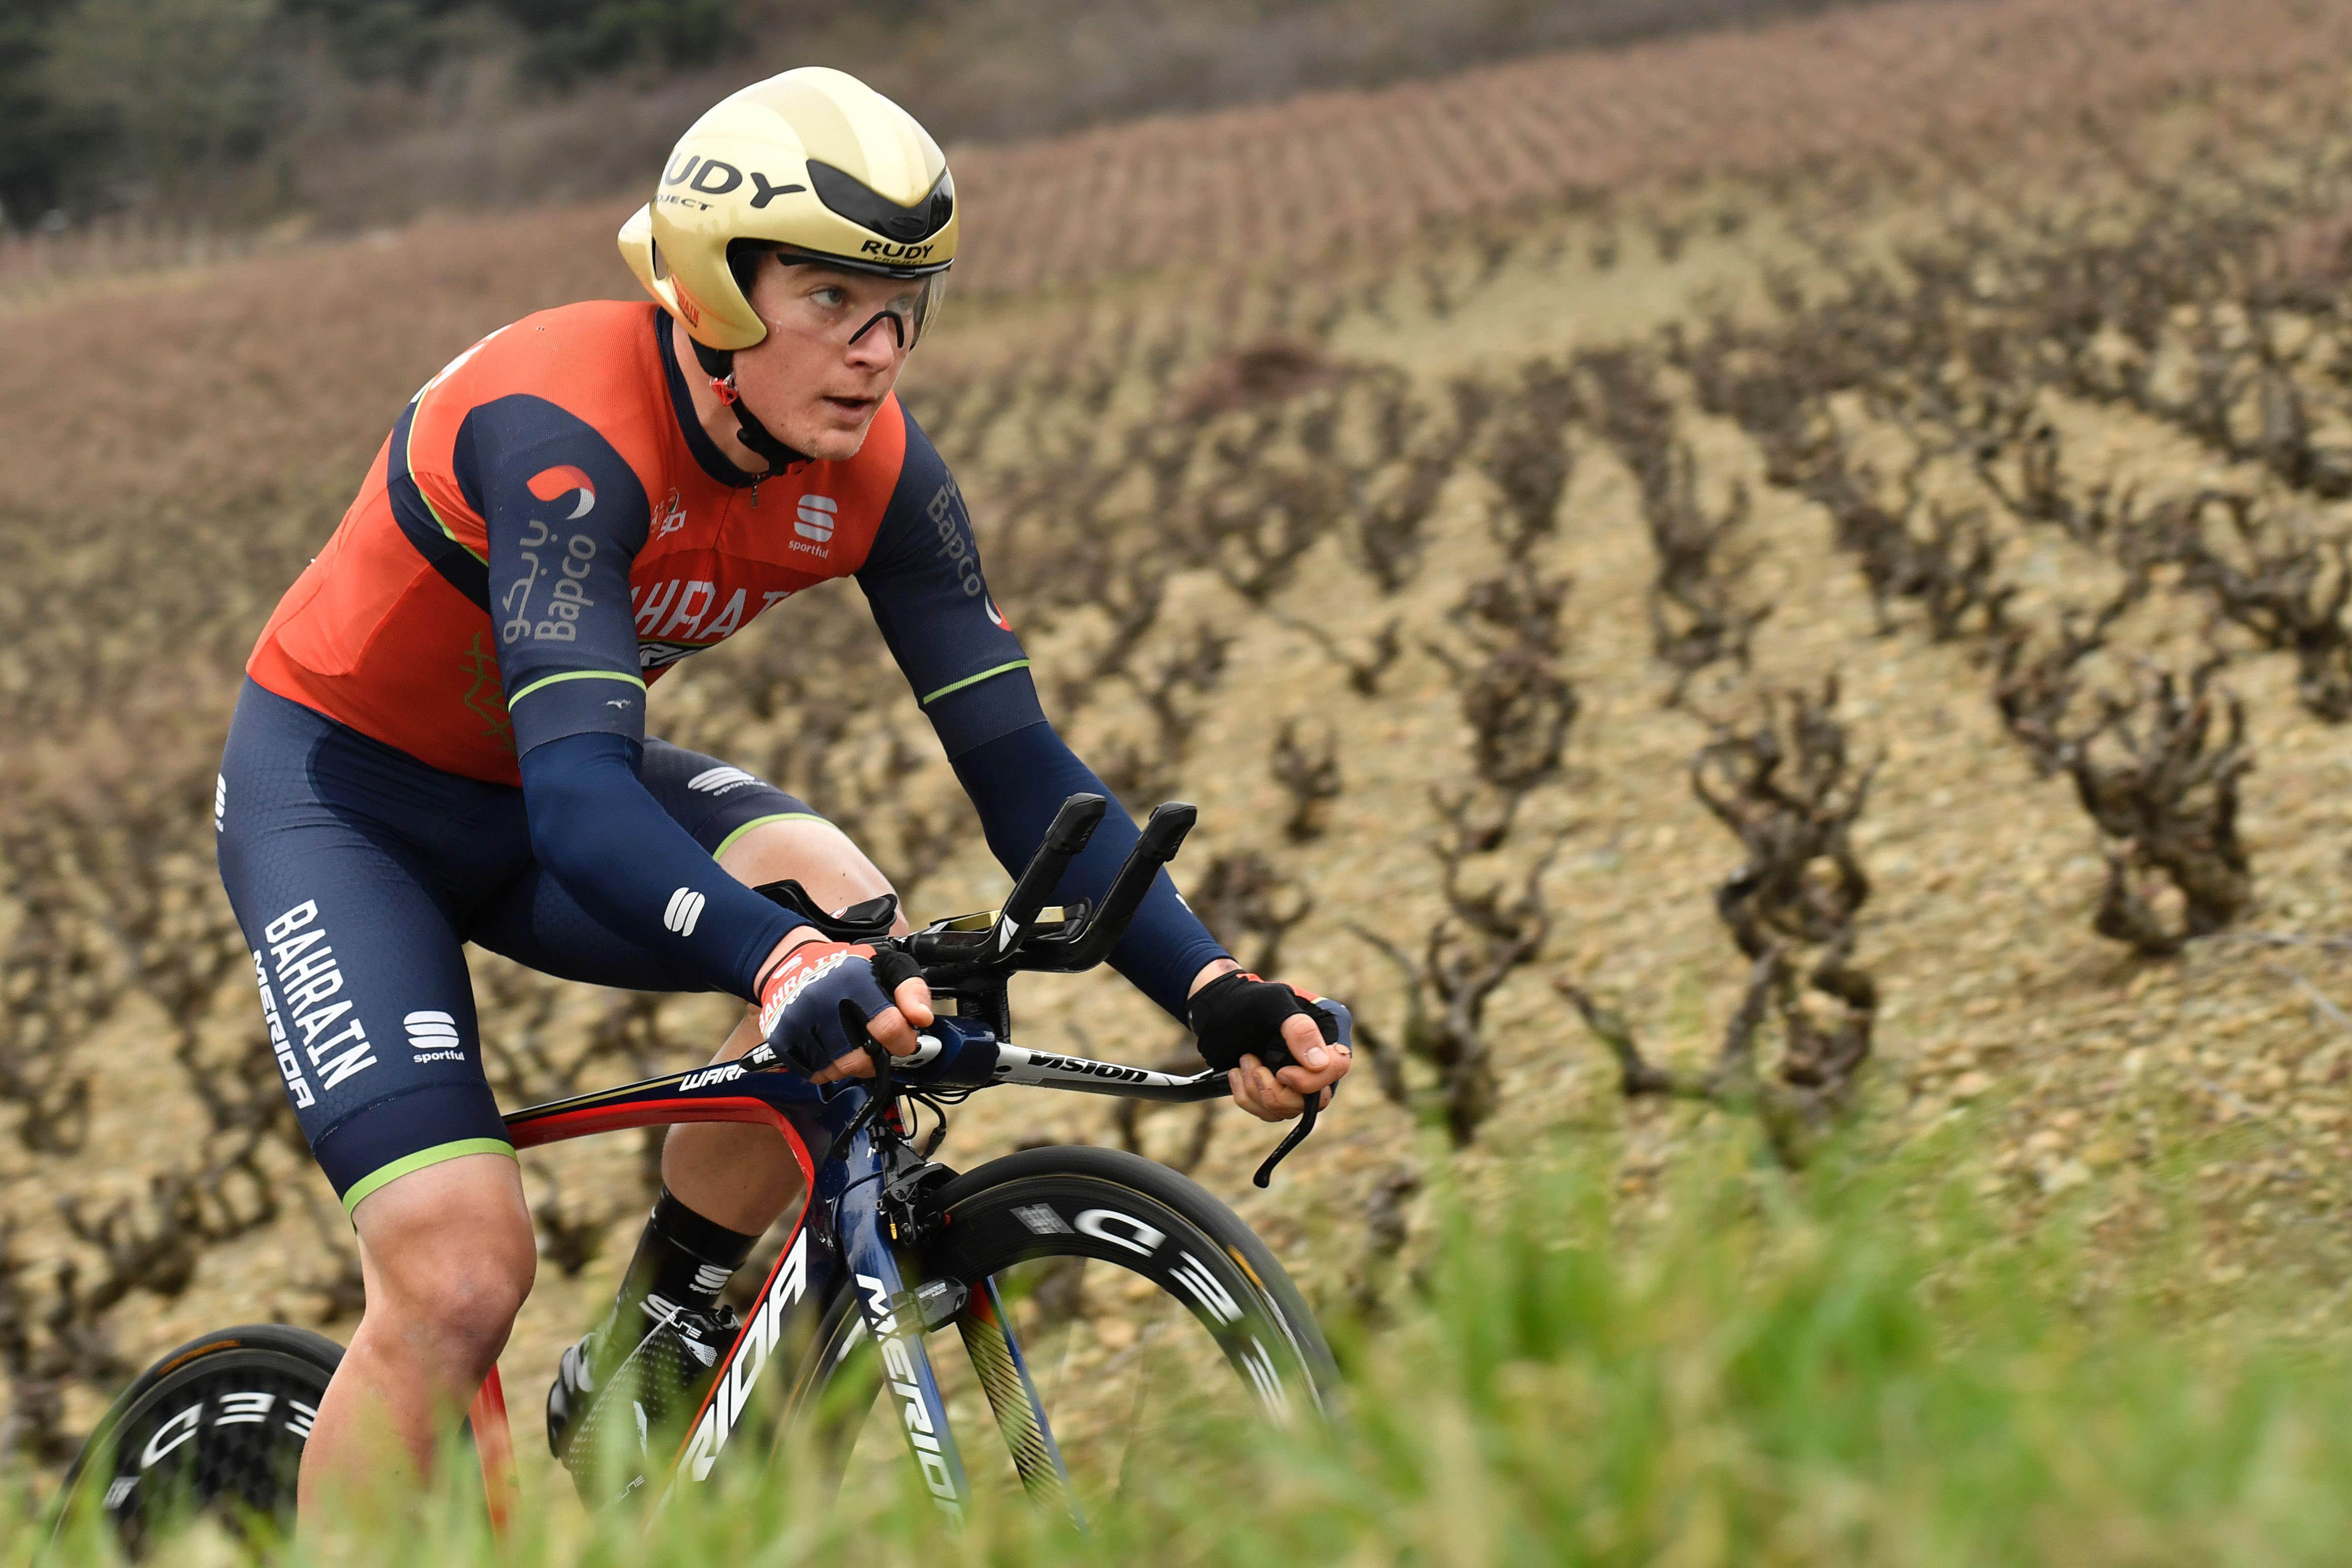 Luka Pibernik was riding the Giro d'Italia stage from Pedara to Messina on the Italian island of Sicily